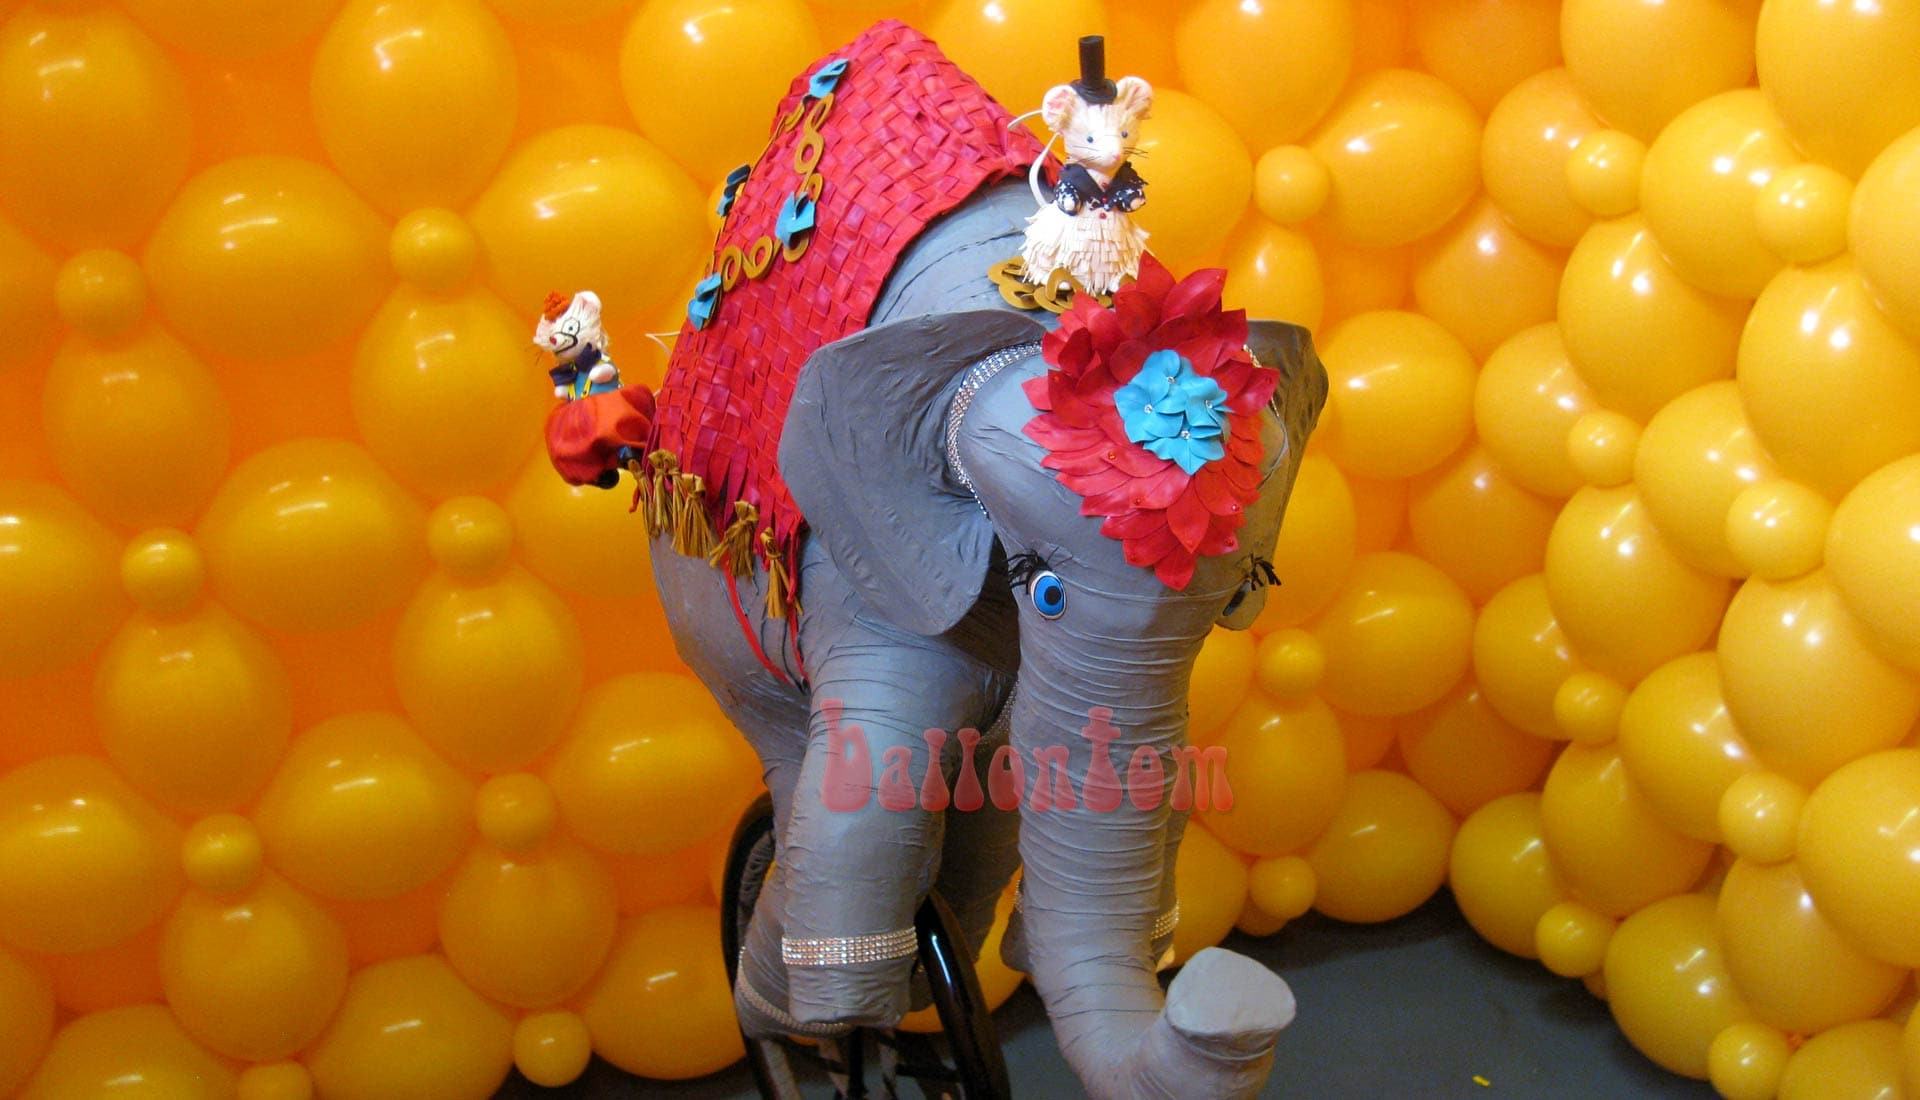 Weltrekord! Größtes Ballonlabyrinth mit über 100.000 Ballons mit ballontom - Elefant ist alles aus Ballons